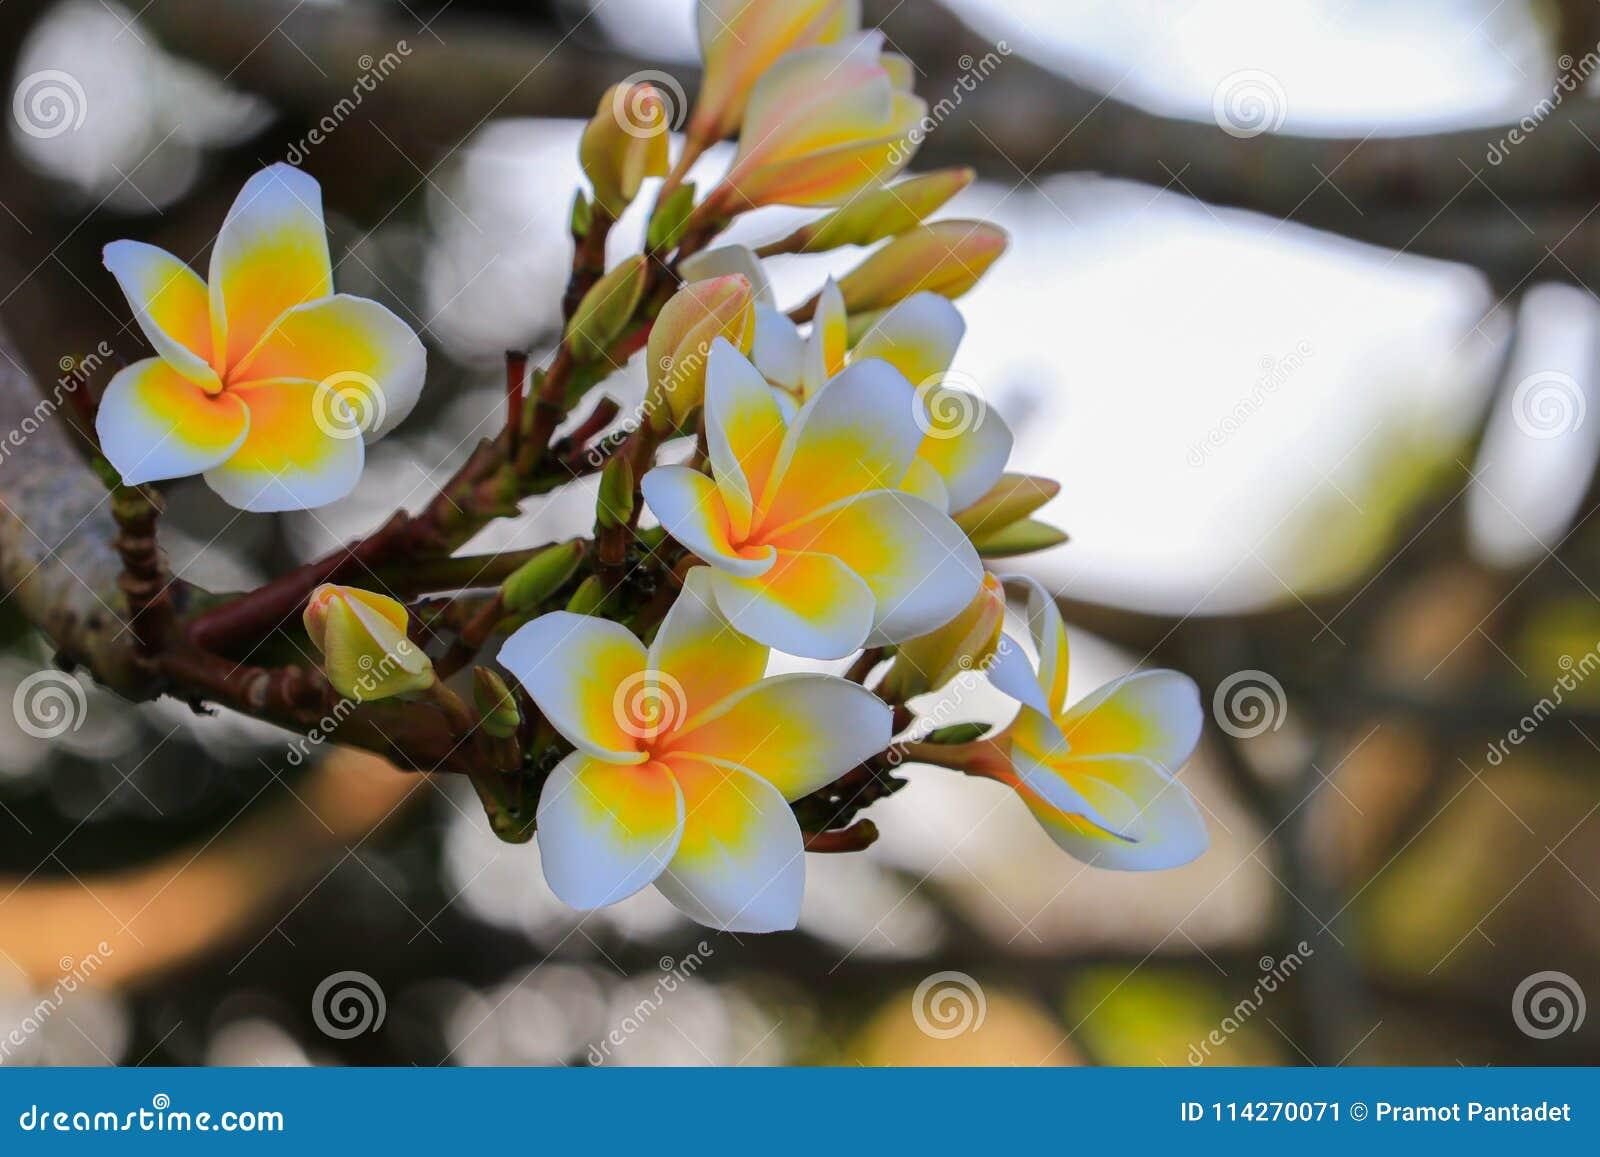 Plumeria Flower White And Pollen Yellow Beautiful On Tree Comm